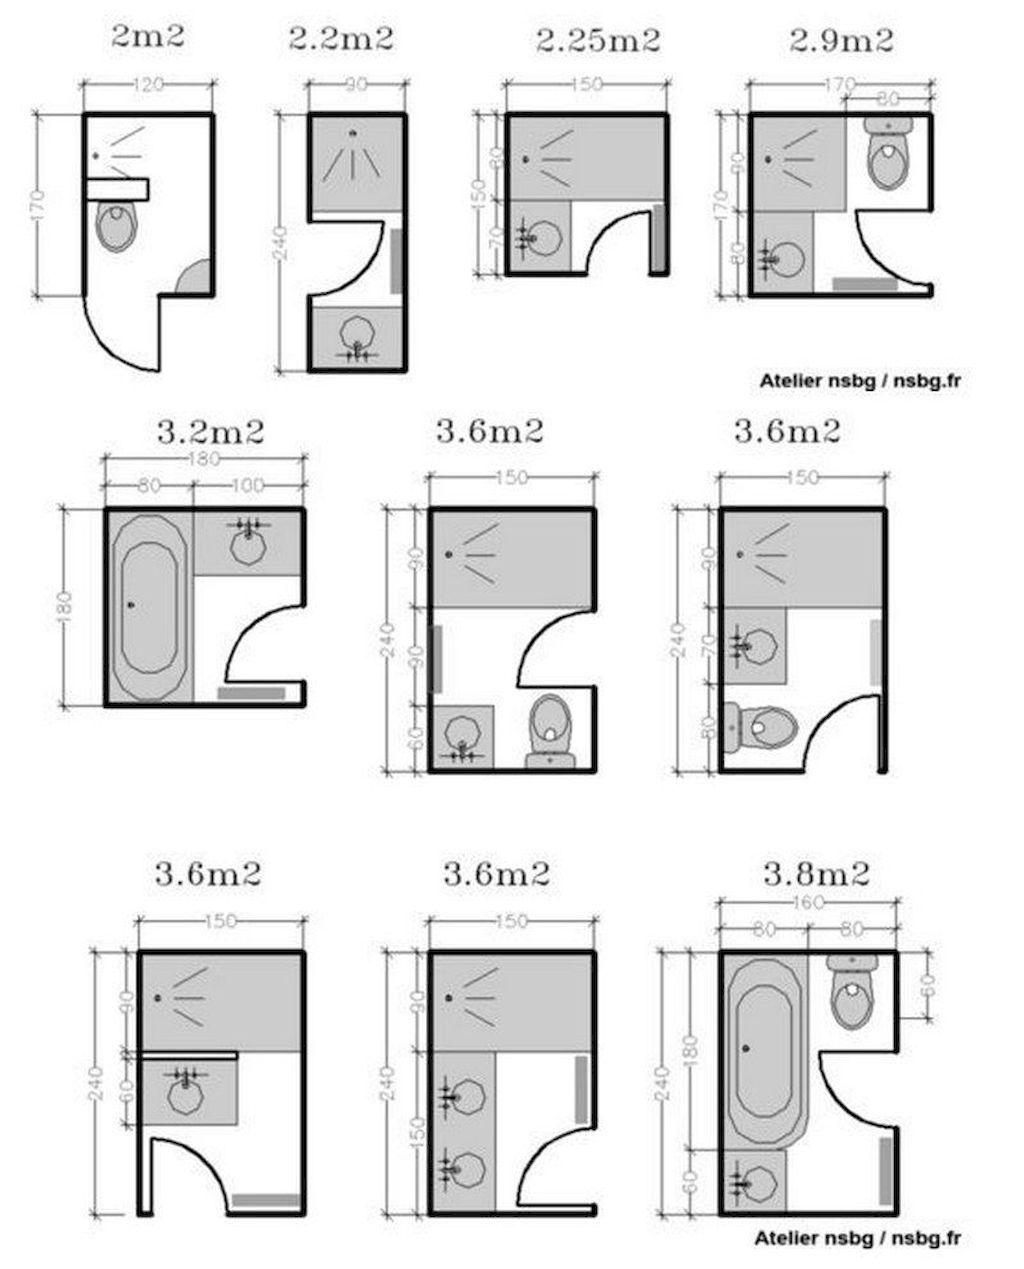 Small Bathroom Design Ideas Apartment Therapy Home Design Ide Kamar Mandi Denah Lantai Kamar Mandi Kecil